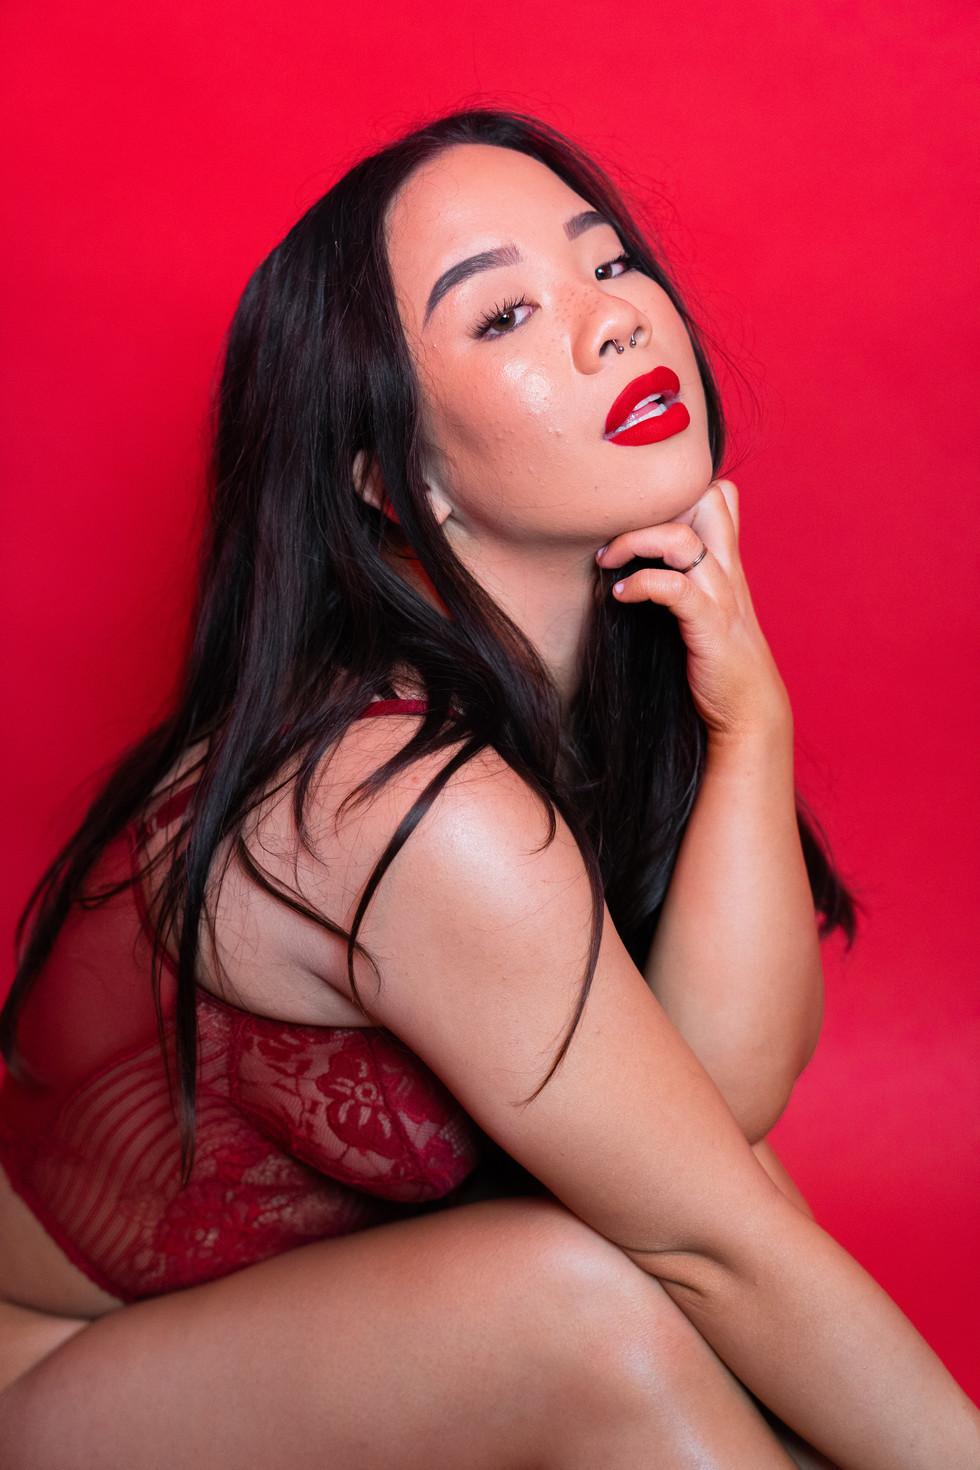 Girl With Red Lipstick | Portrait/Fashion Photography | Chromatone Studios